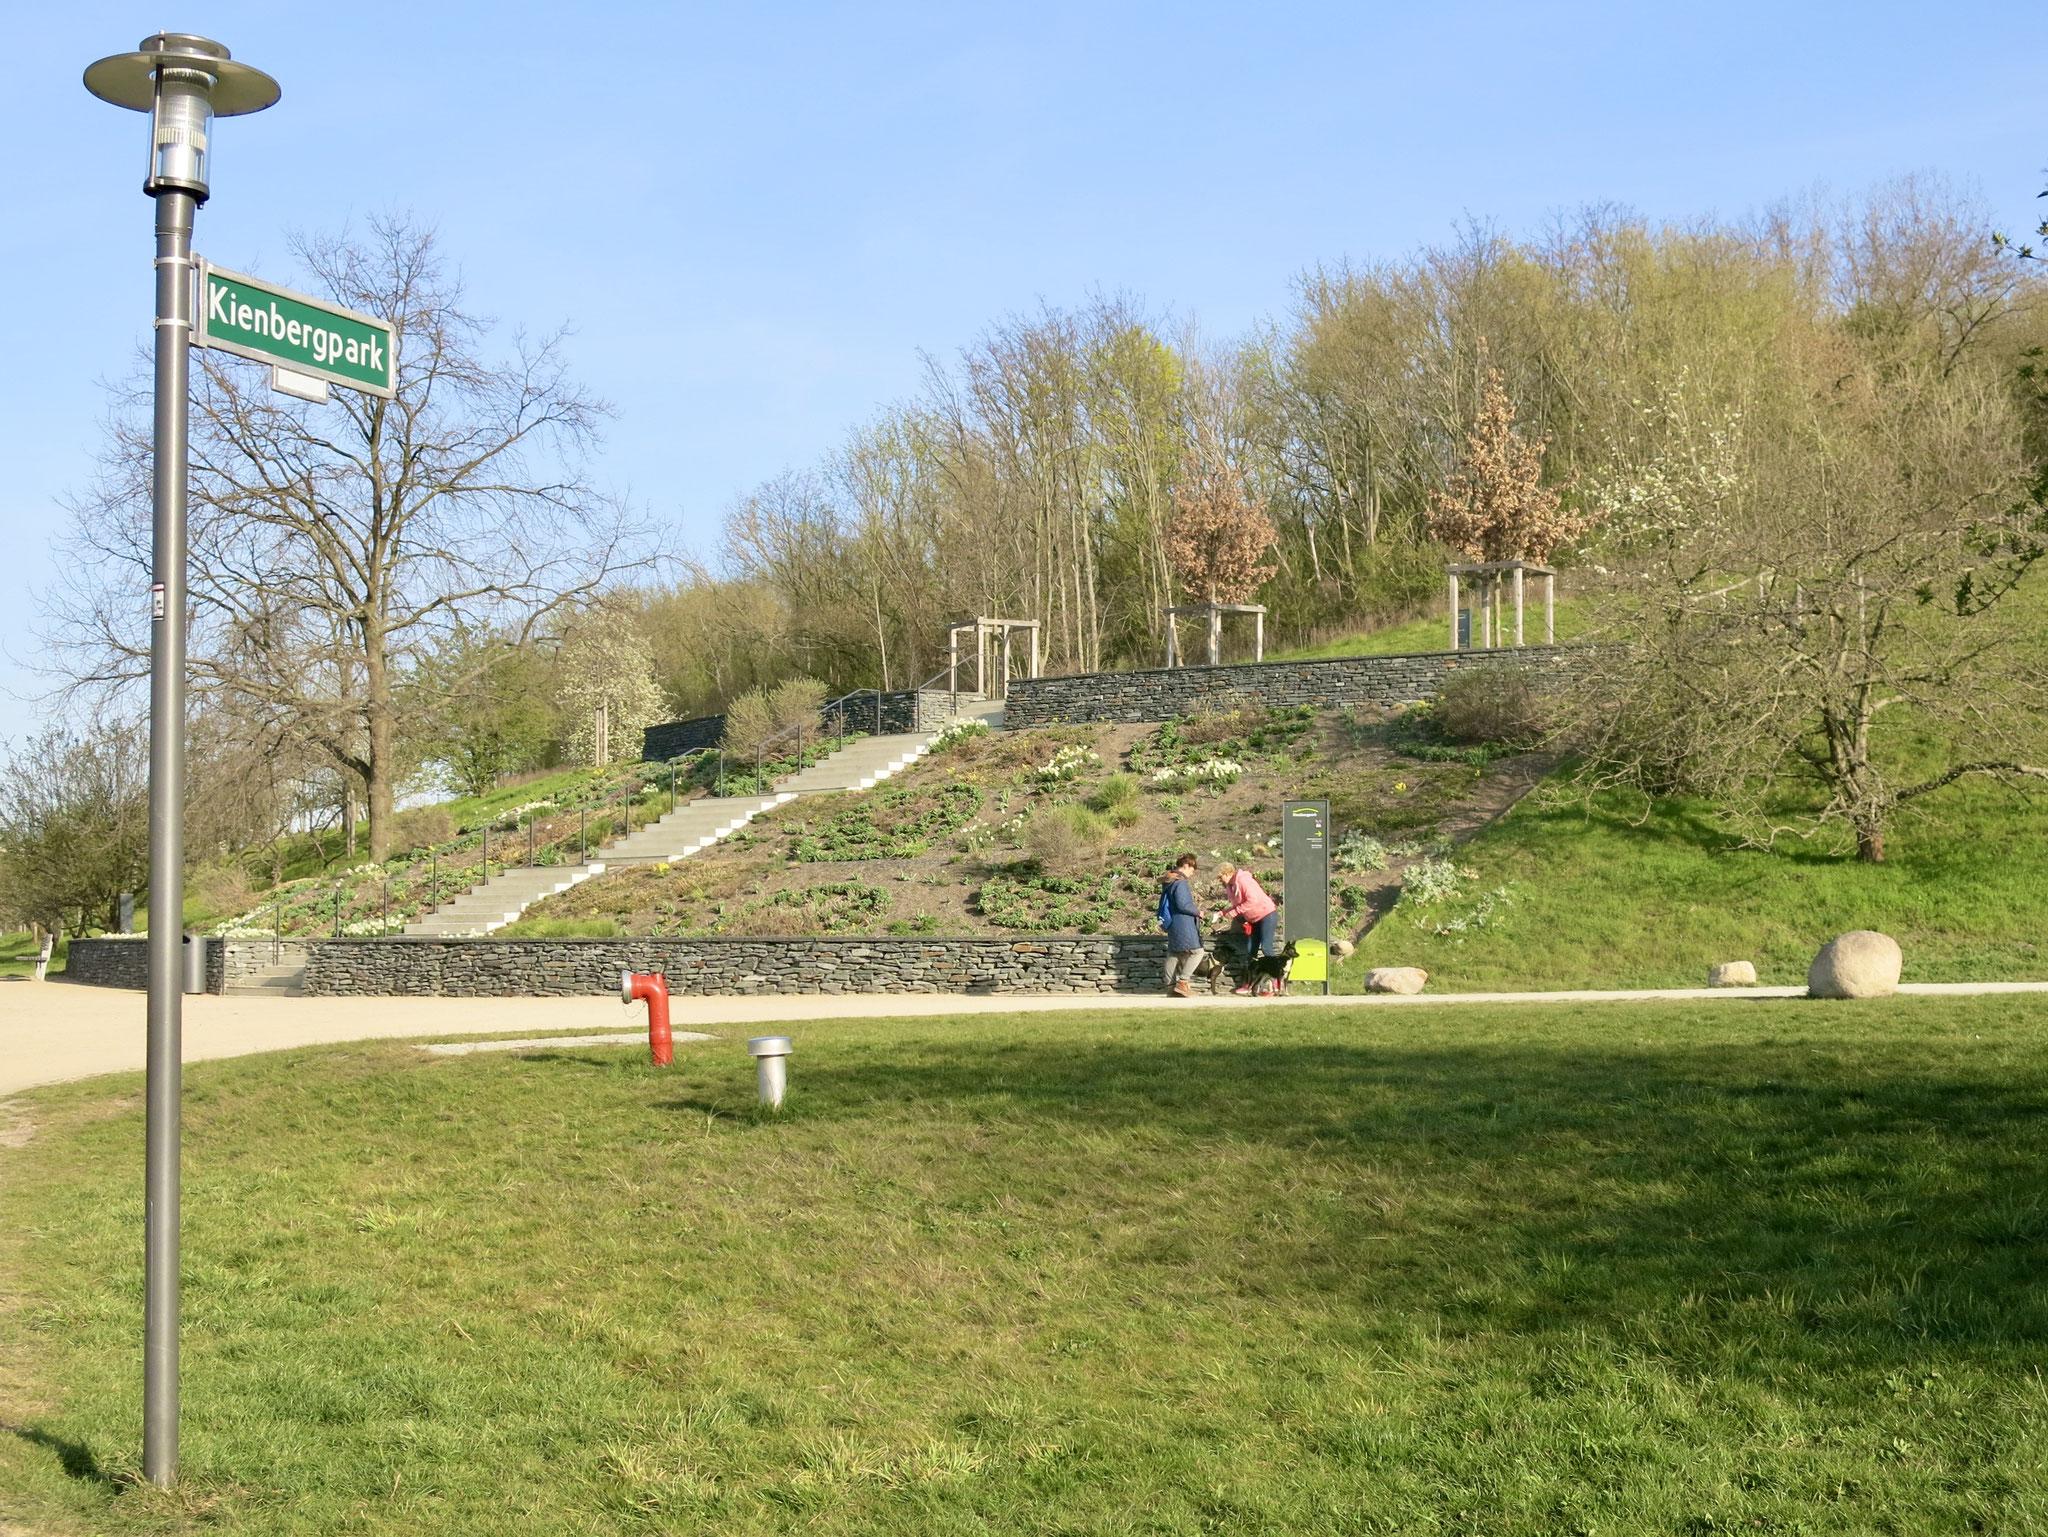 Tipp 9: Kienberg, Kienbergterrassen